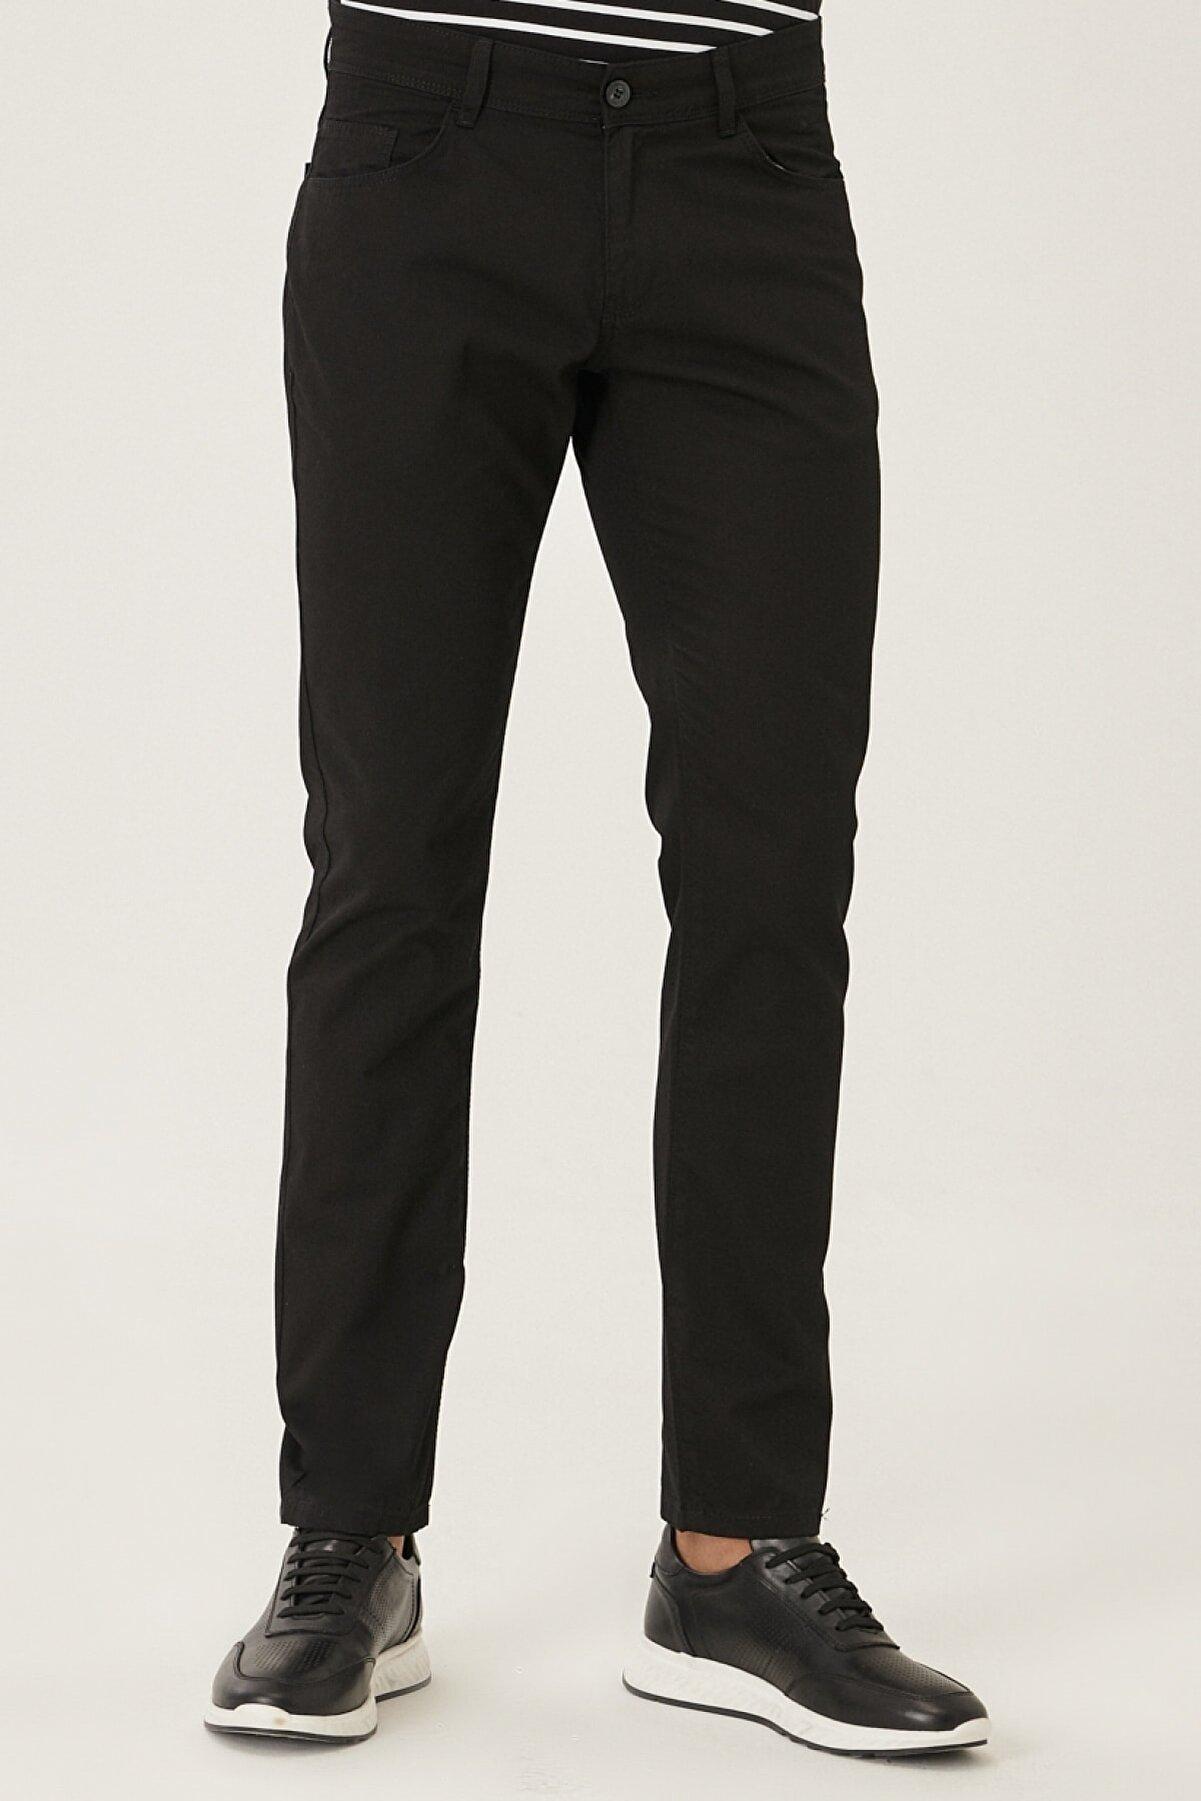 Altınyıldız Classics Kanvas Slim Fit Dar Kesim %100 Koton 5 Cep Pantolon